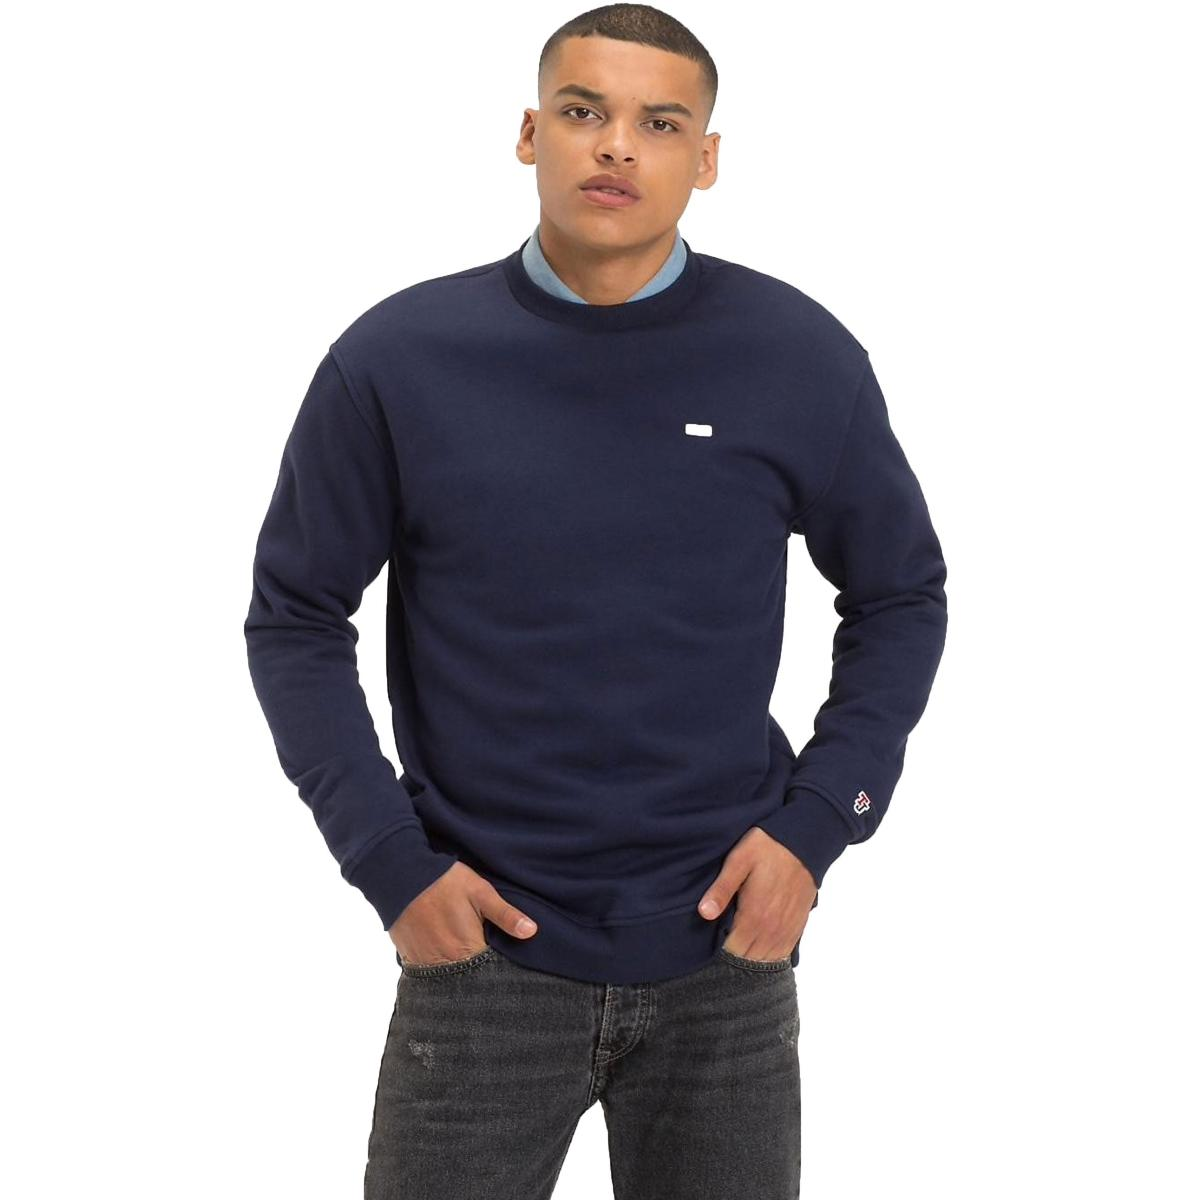 Felpa girocollo Tommy Jeans Classics da uomo rif. DM0DM04469